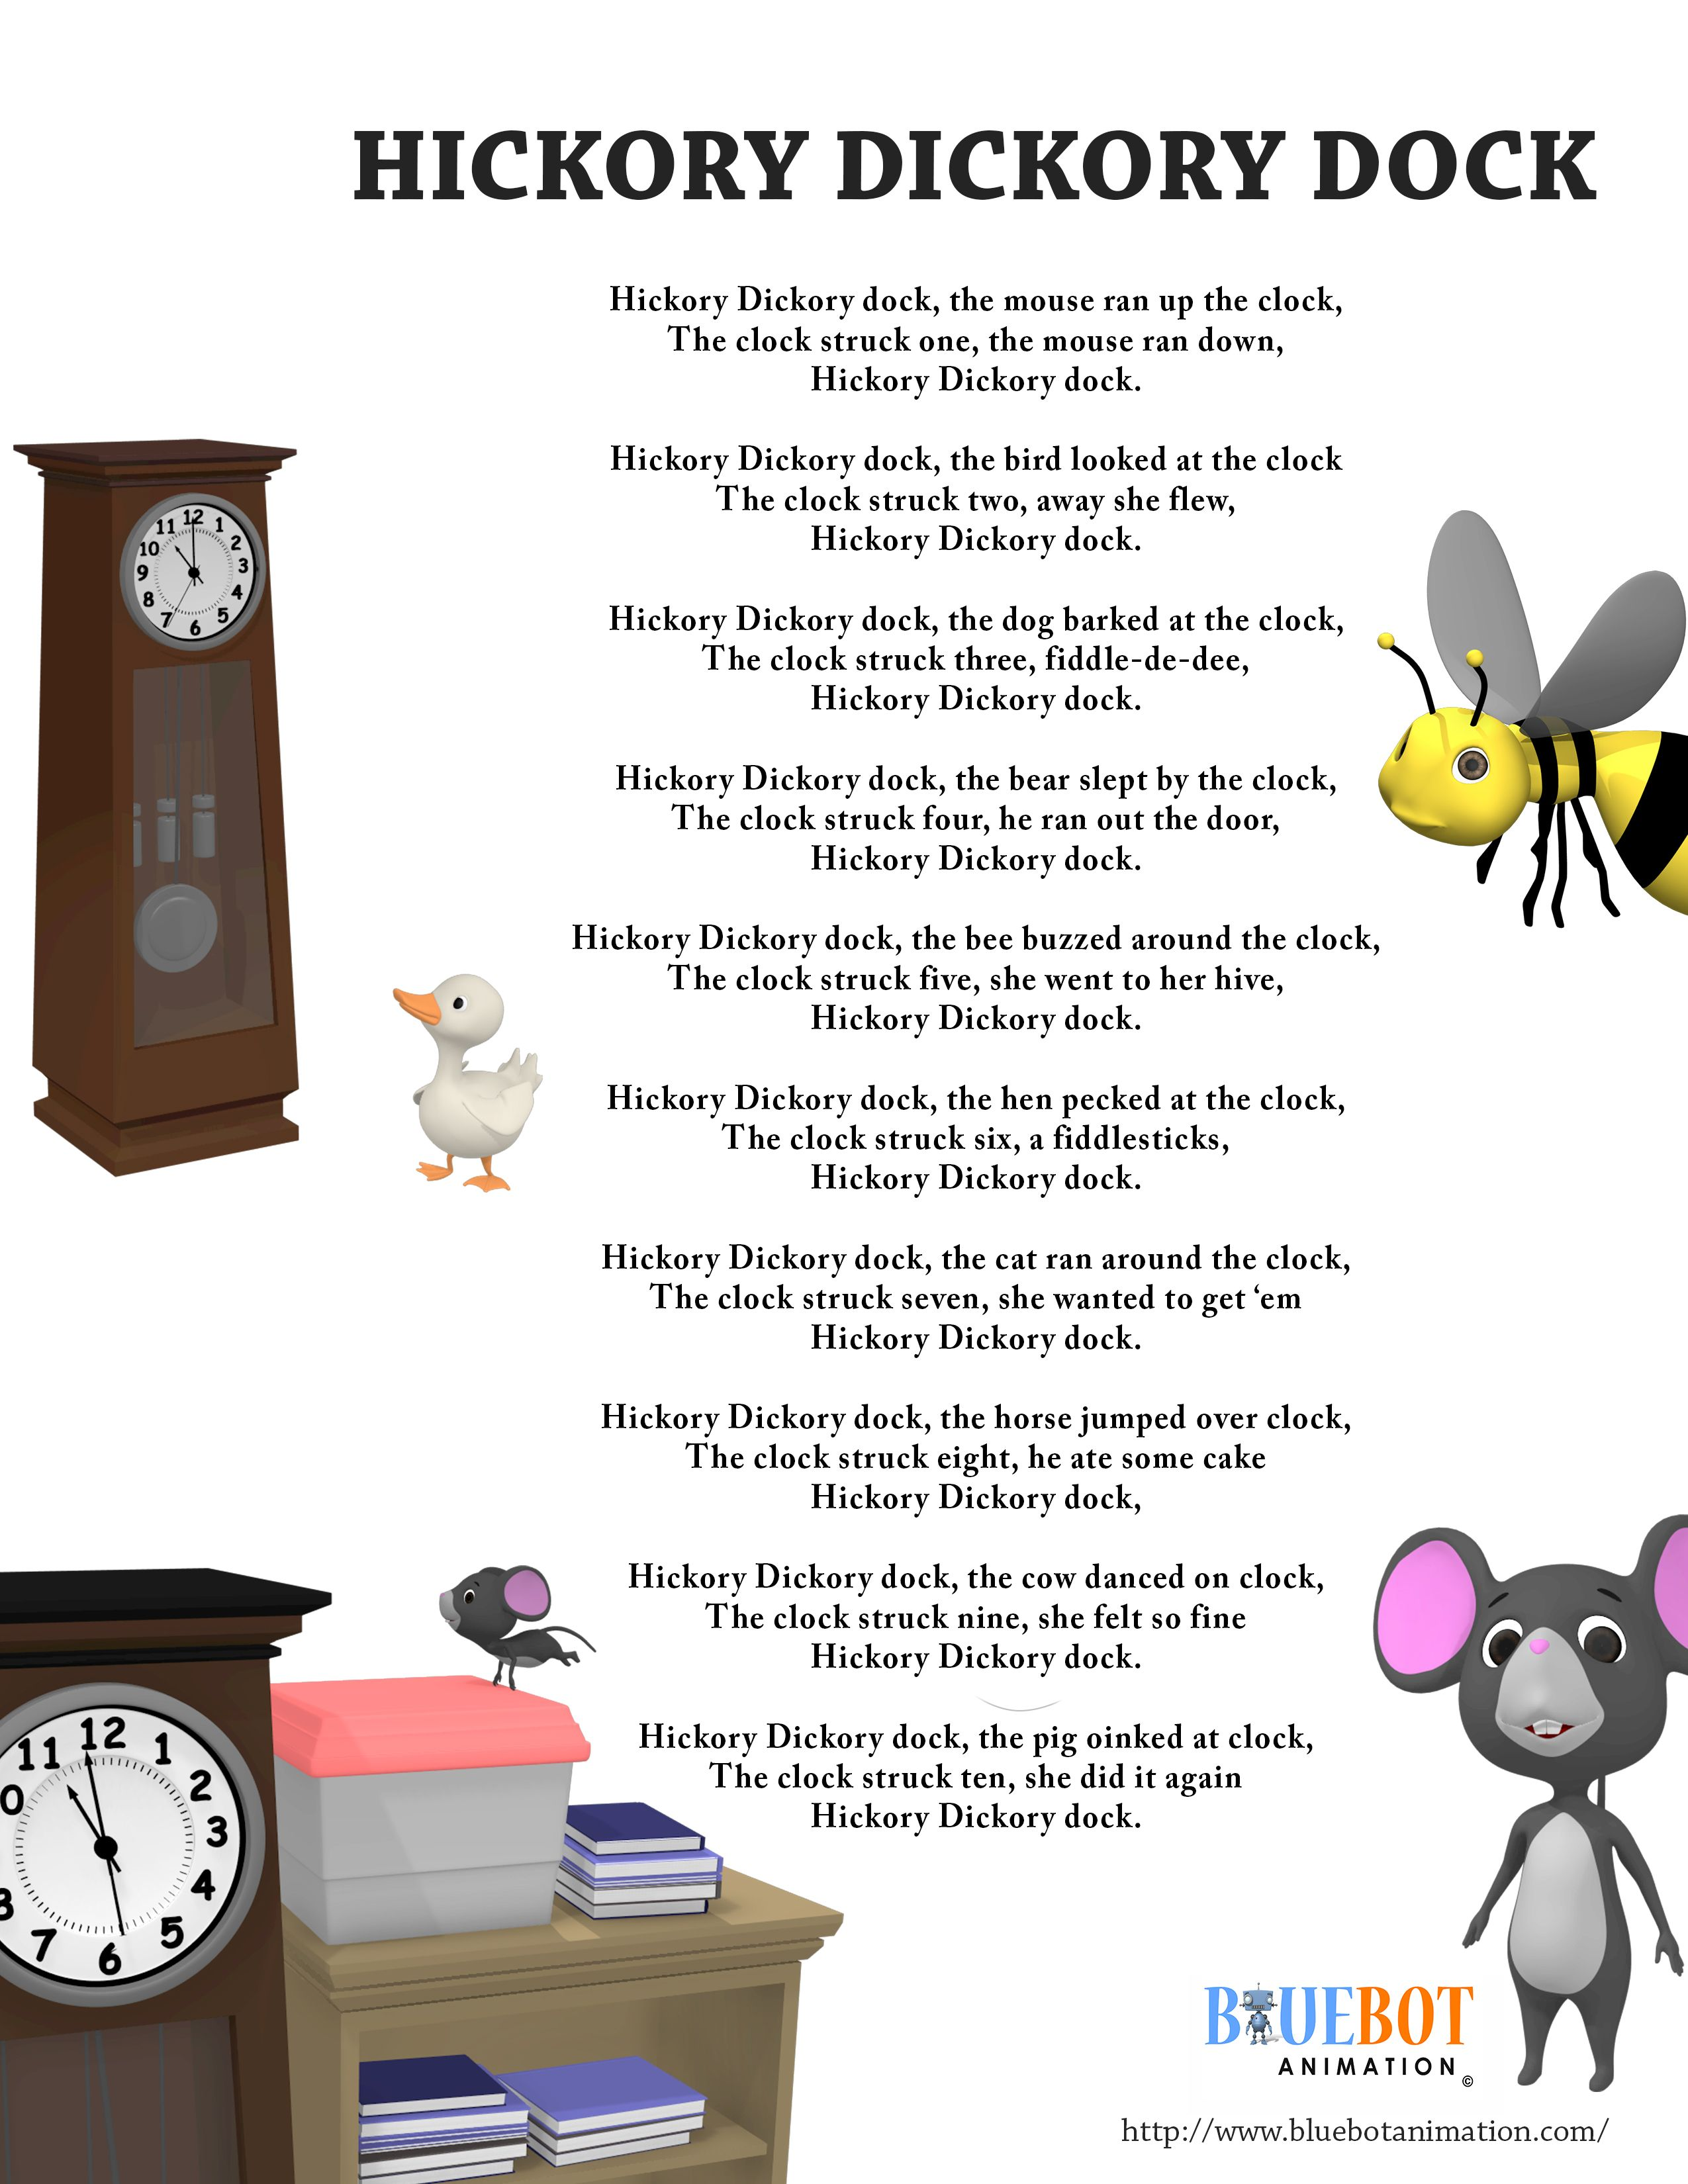 Hickory Dickory Dock Nursery Rhyme Lyrics Free Printable